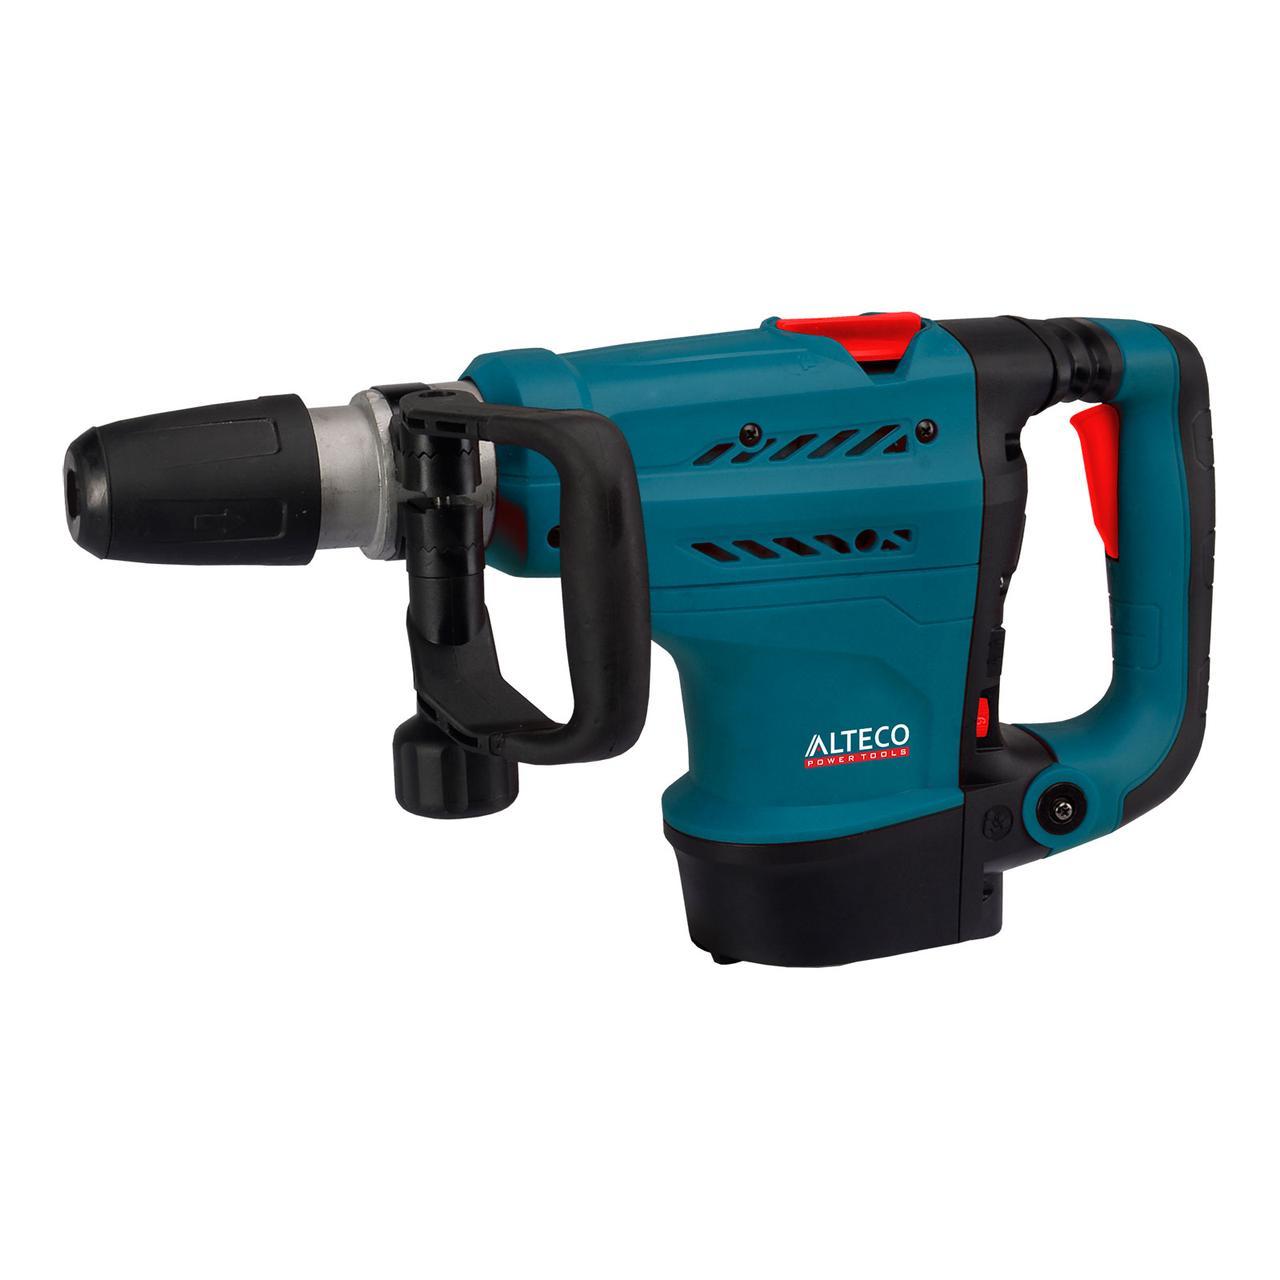 ALTECO RH 1200-45 SDS-Max Перфоратор